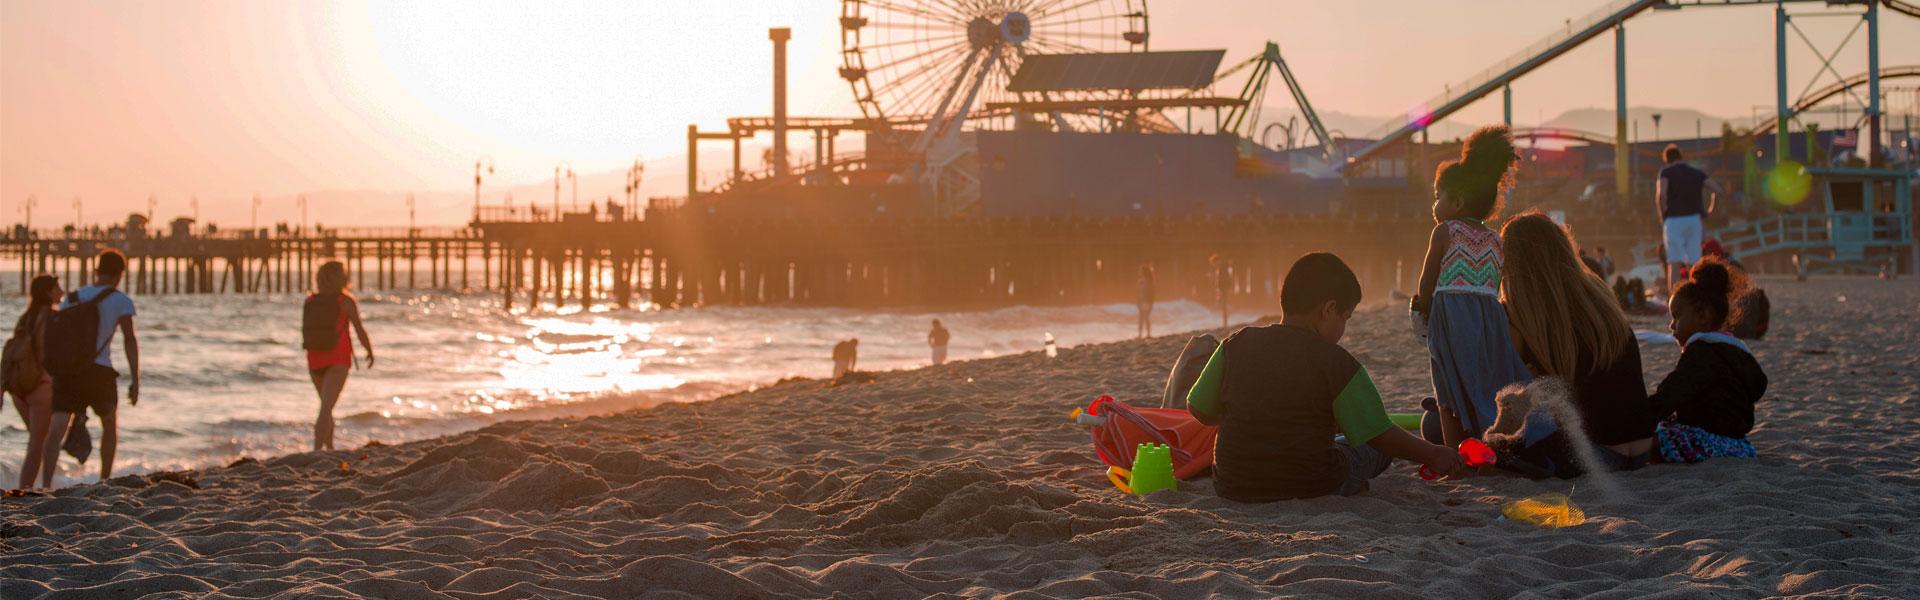 View of Santa Monica Pier at Sunset